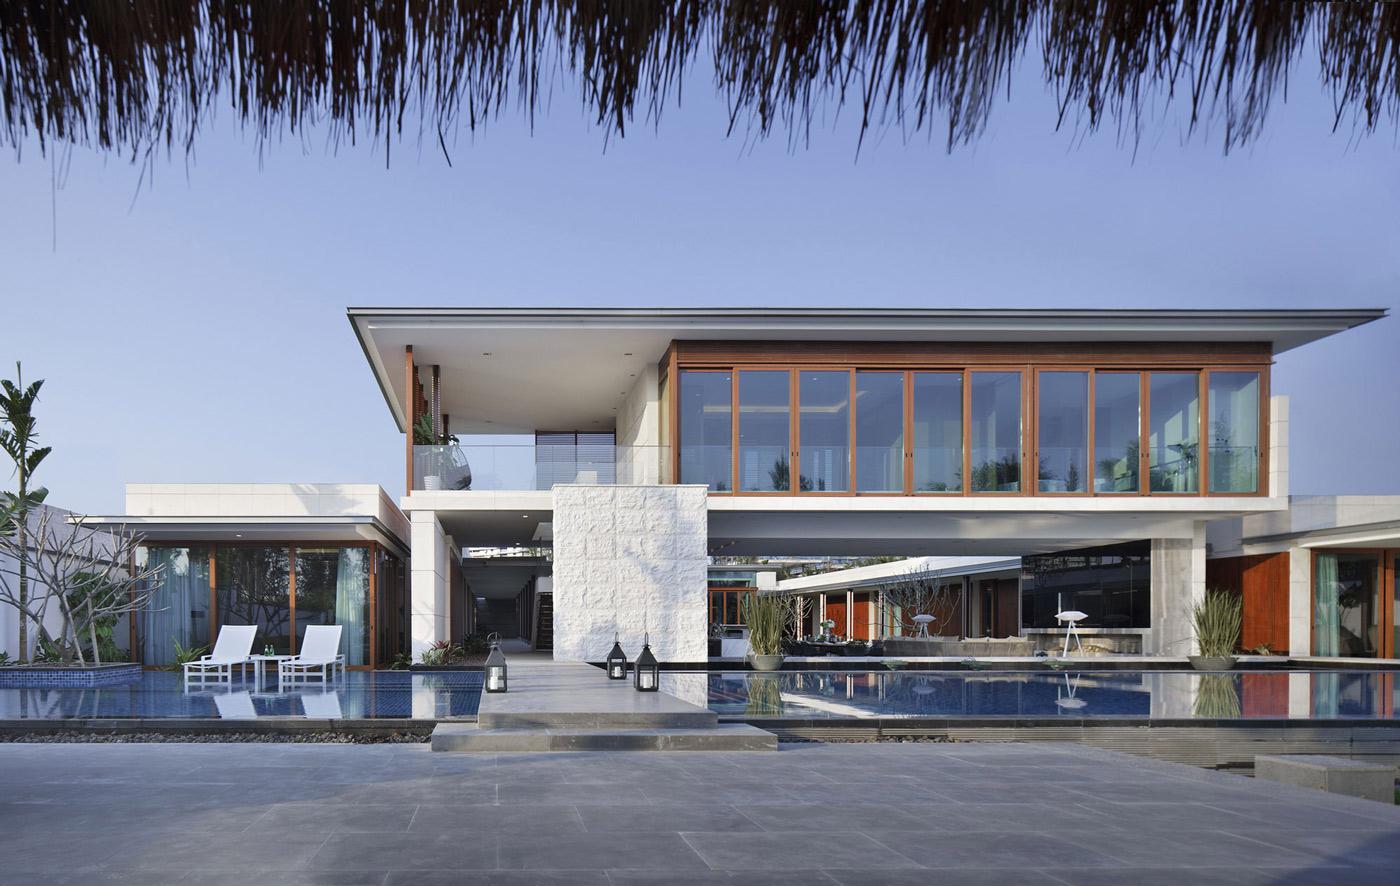 Terrace, Pool, Bridge, Beachside Villas in Lingshui, Hainan, China